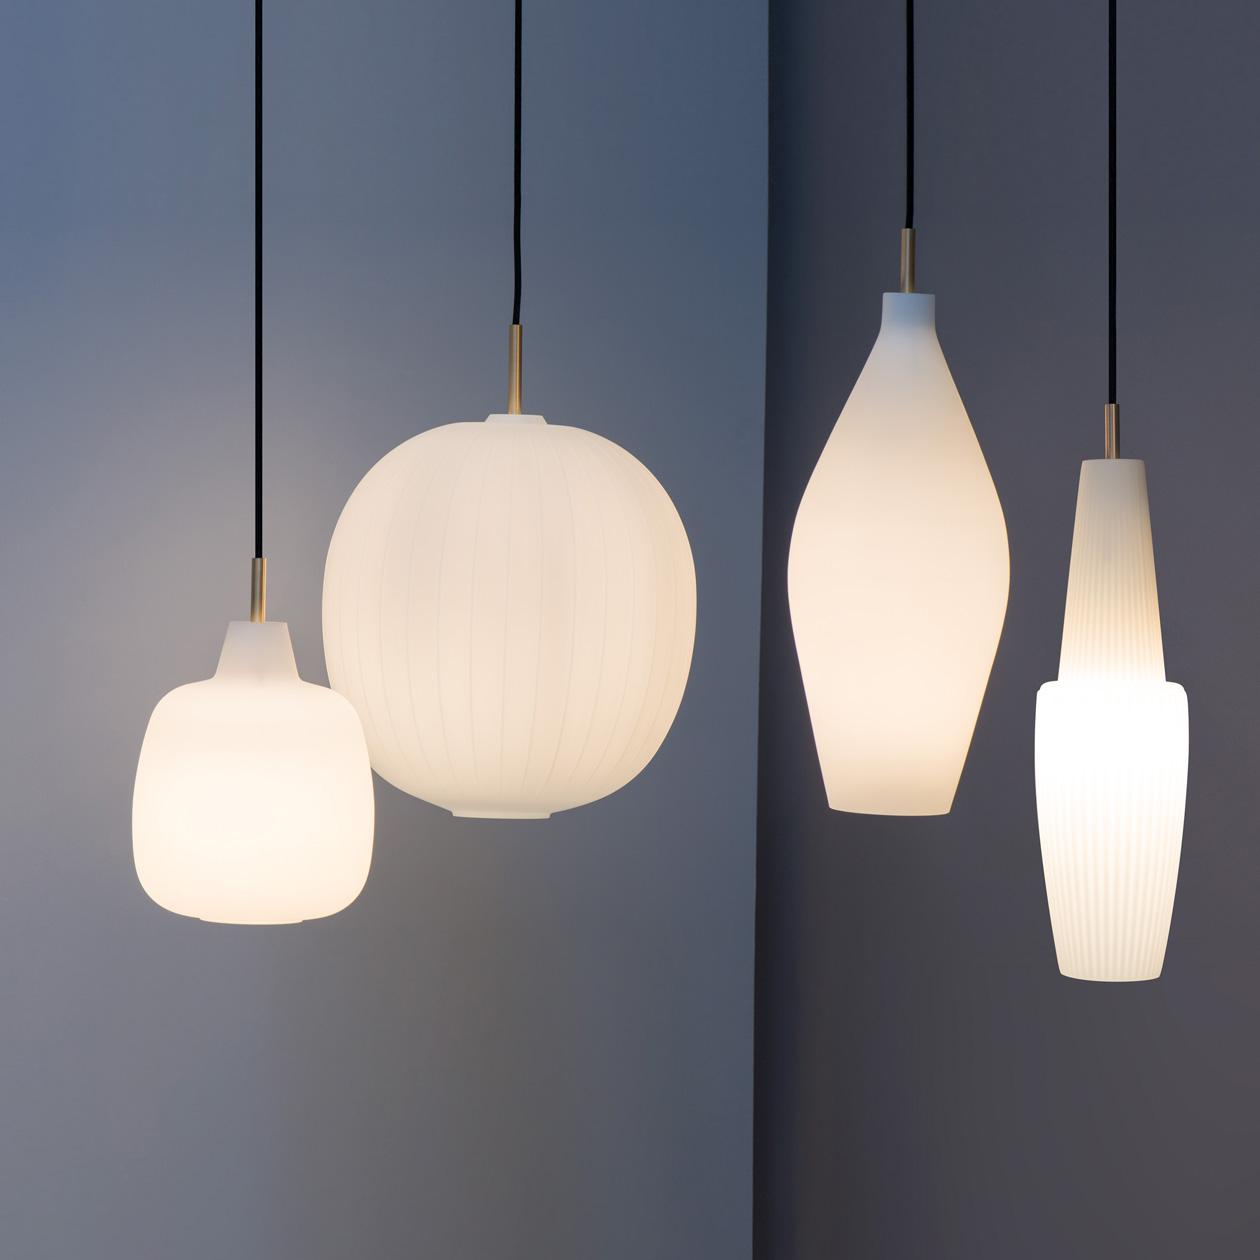 Mawa lampen